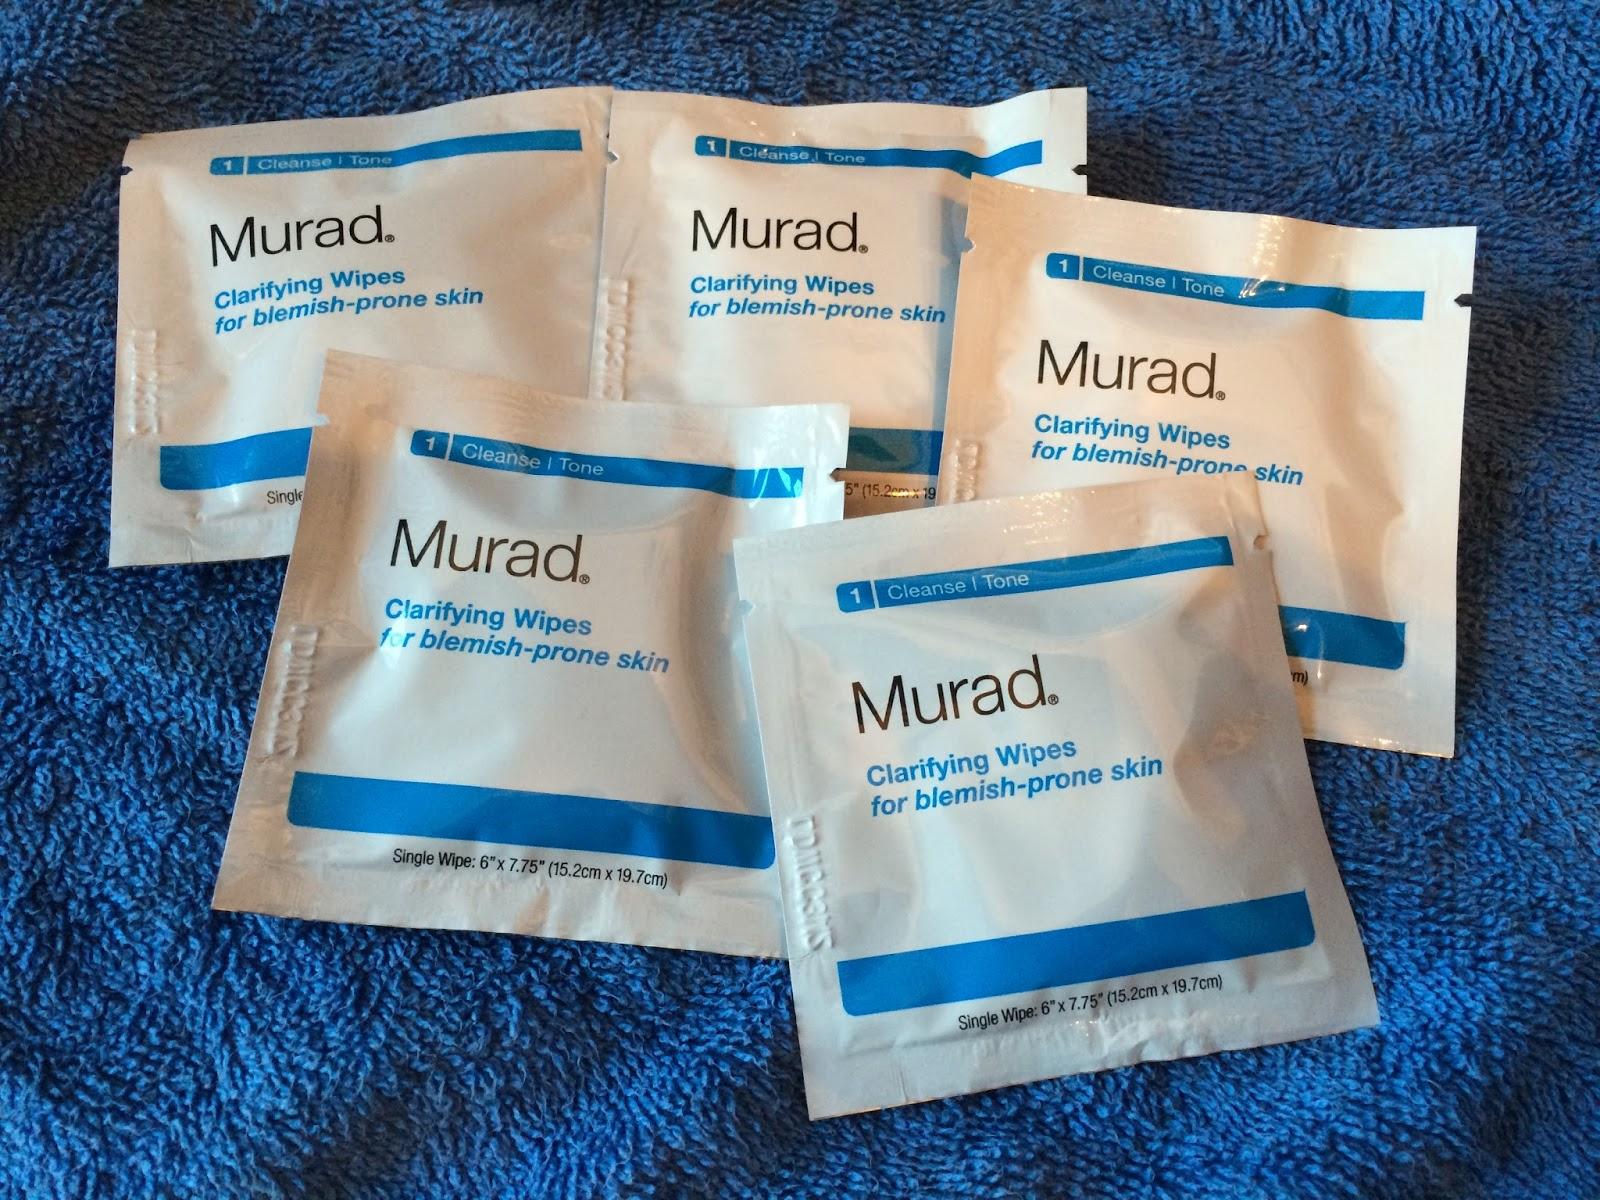 Murad Balance and Protect Travel Kit